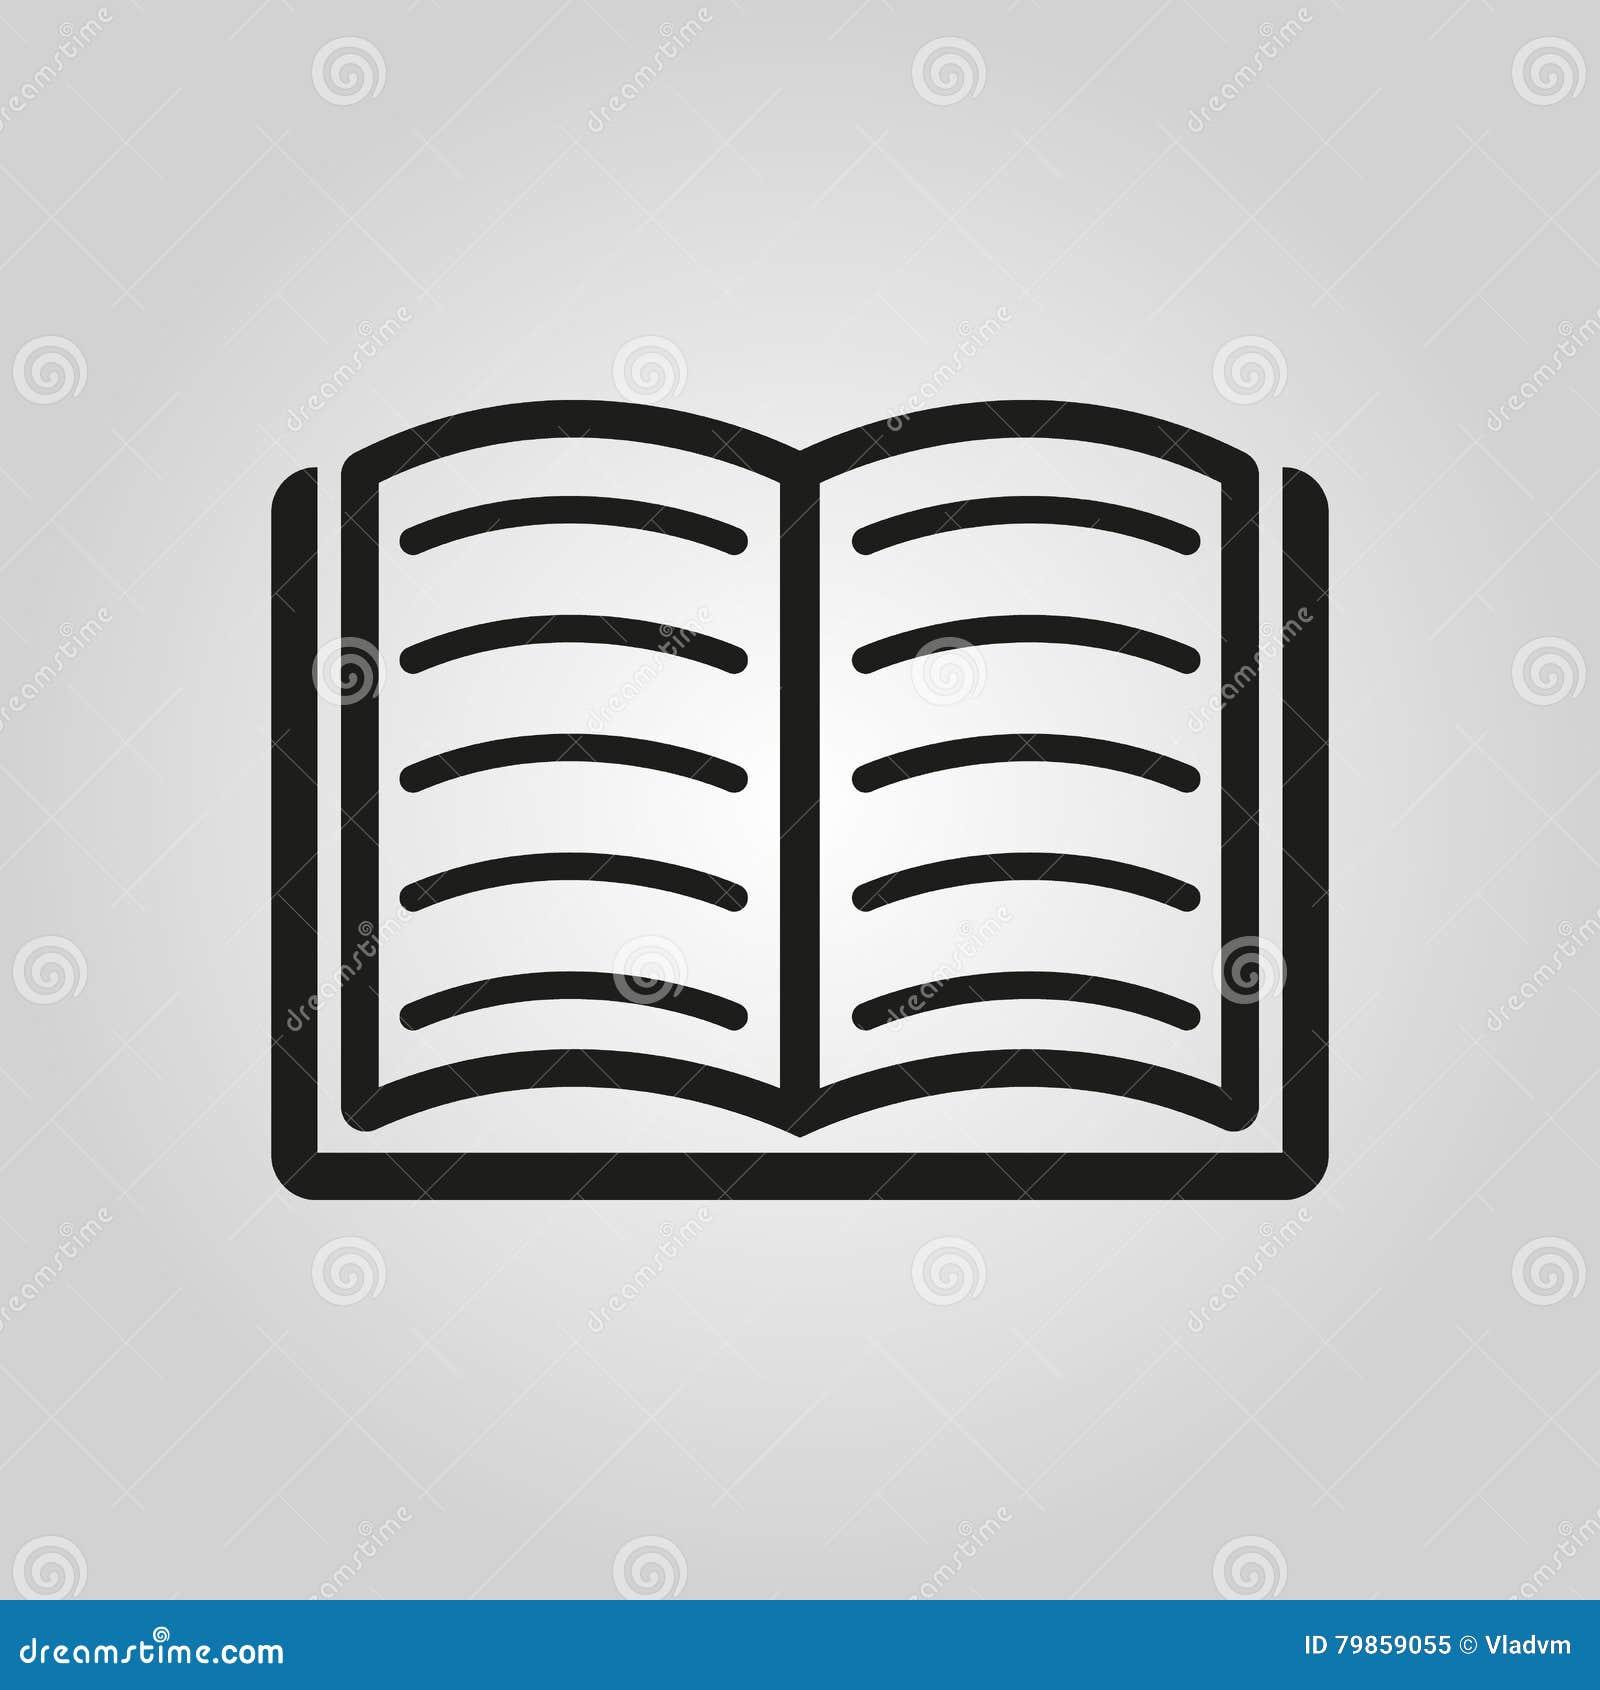 Icone De Livre Conception De Vecteur Symbole De Bibliotheque Web